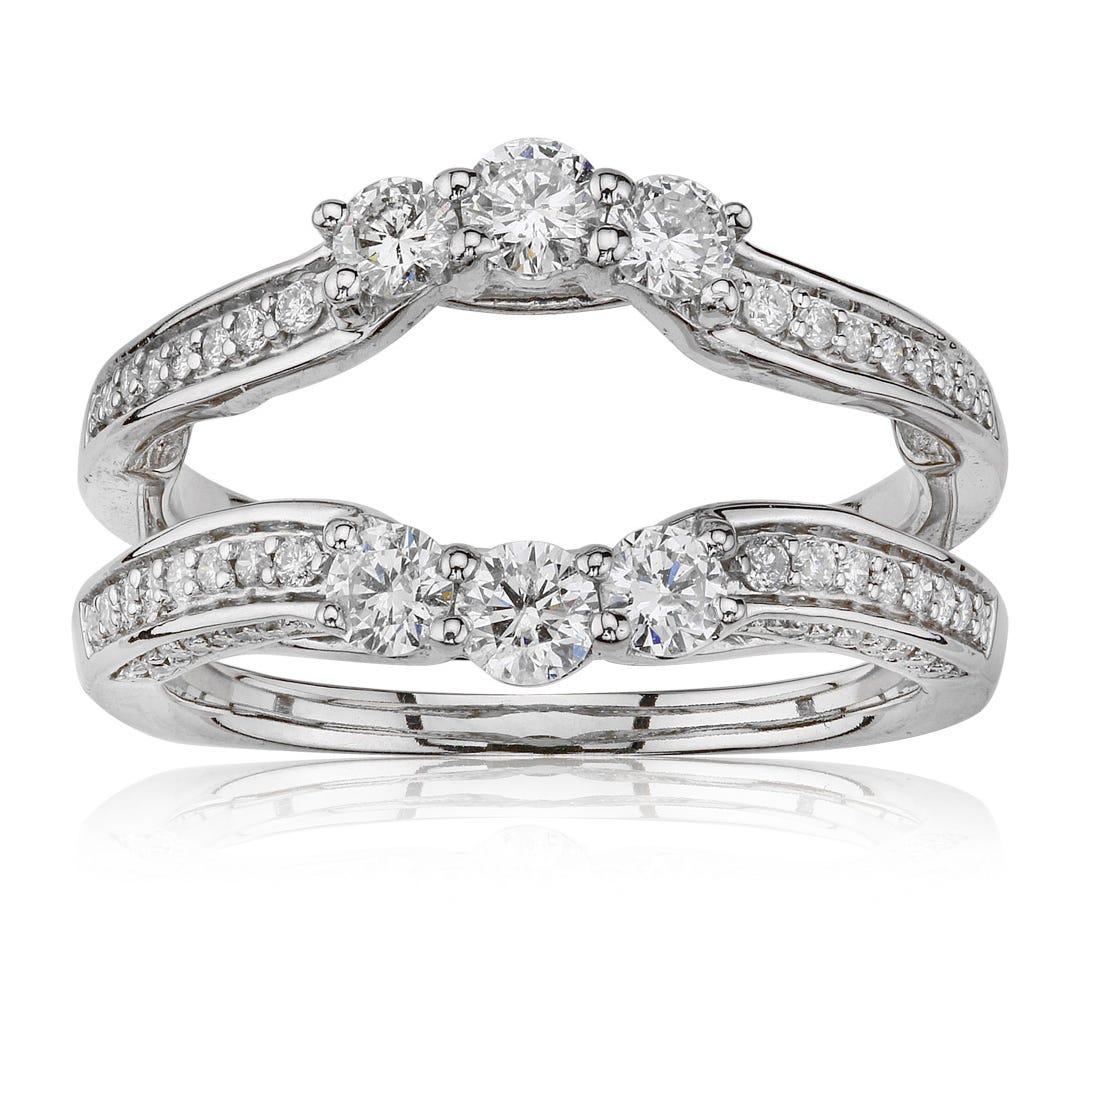 Brilliant-Cut 1ct. t.w. Diamond Engagement Ring Enhancer in 14k White Gold